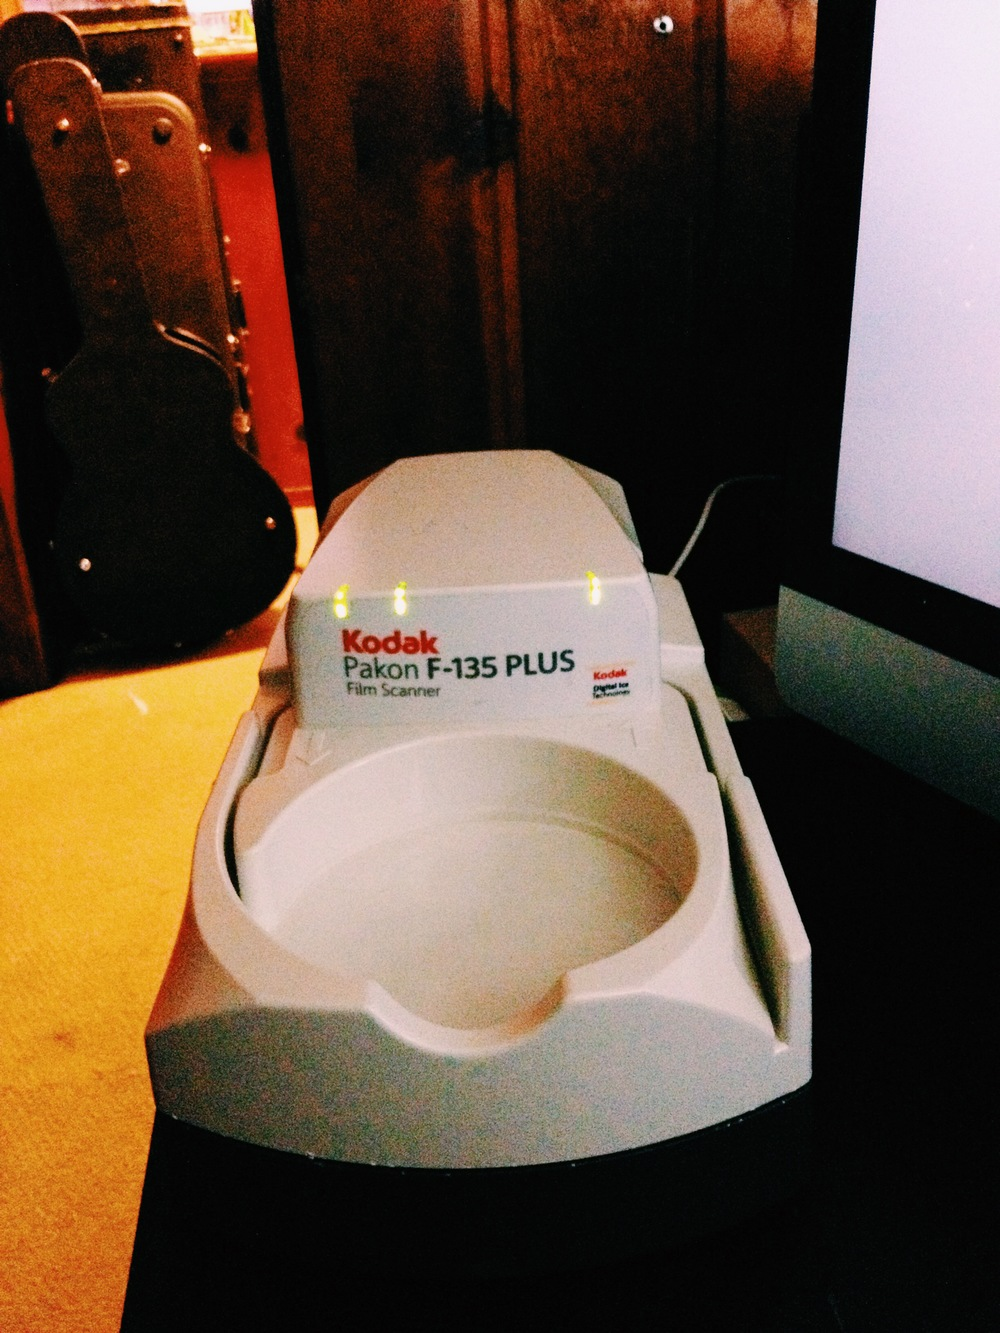 Cameron's Pakon F135 film scanner